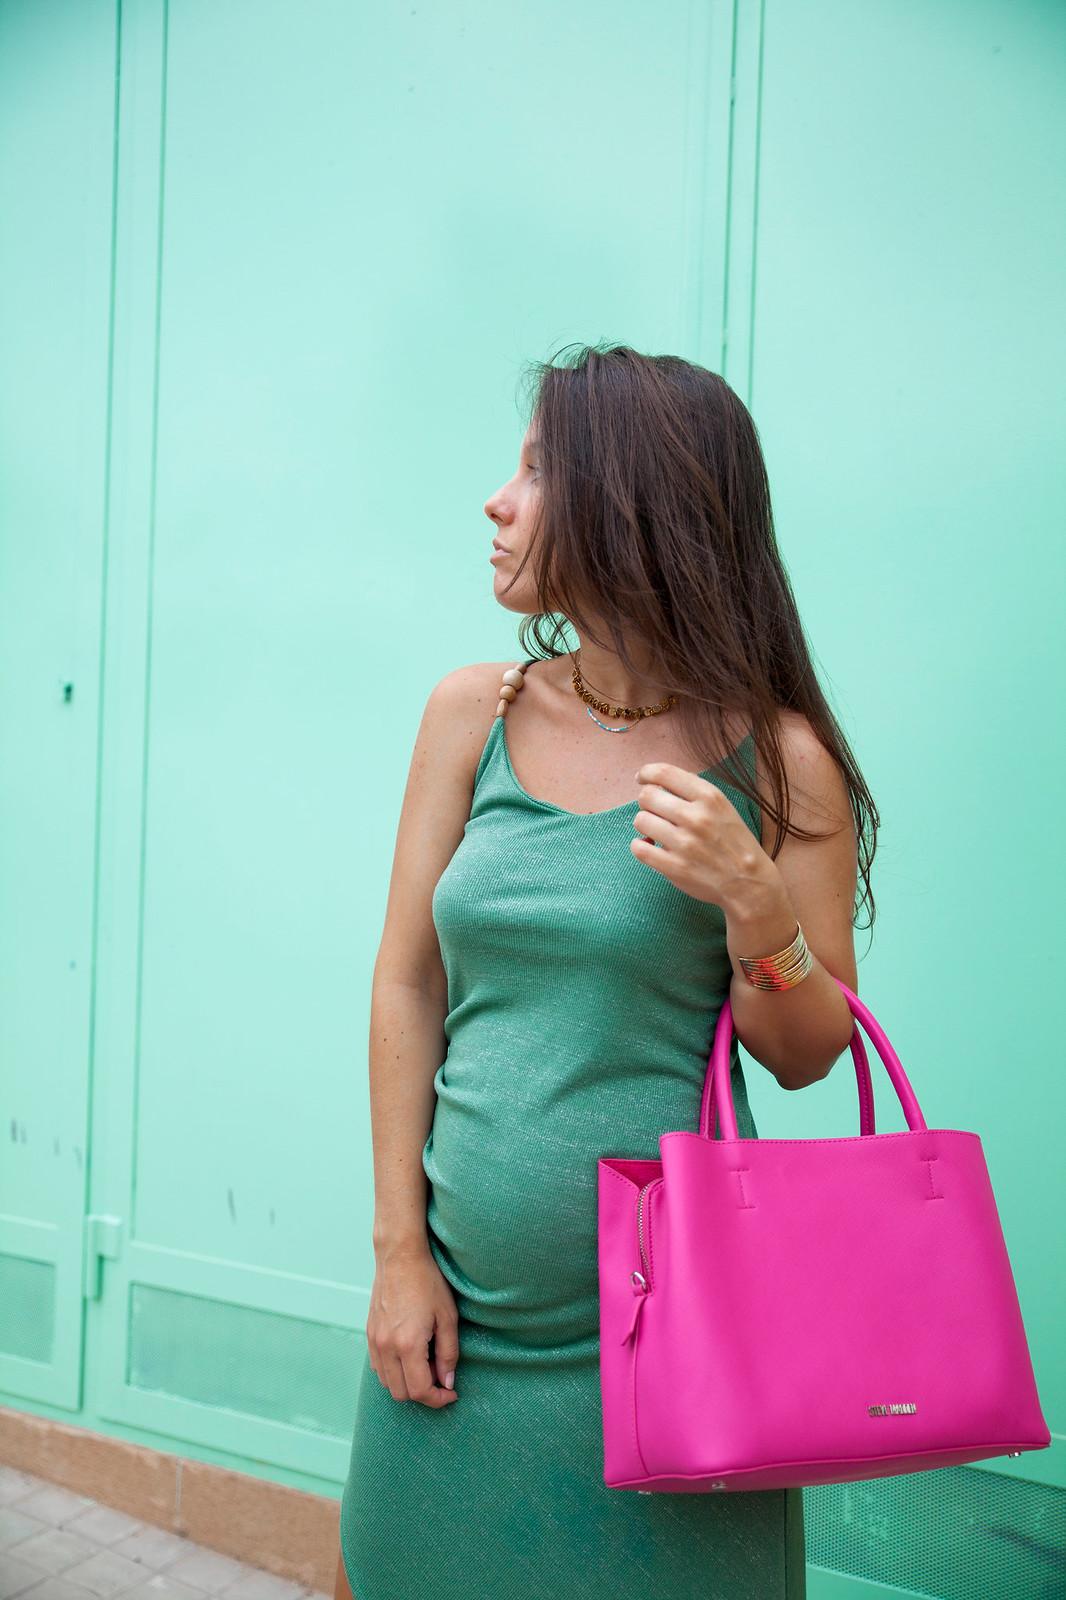 4_Vestido_turquesa_largo_outfit_embarazada_influencer_barcelona_theguestgirl